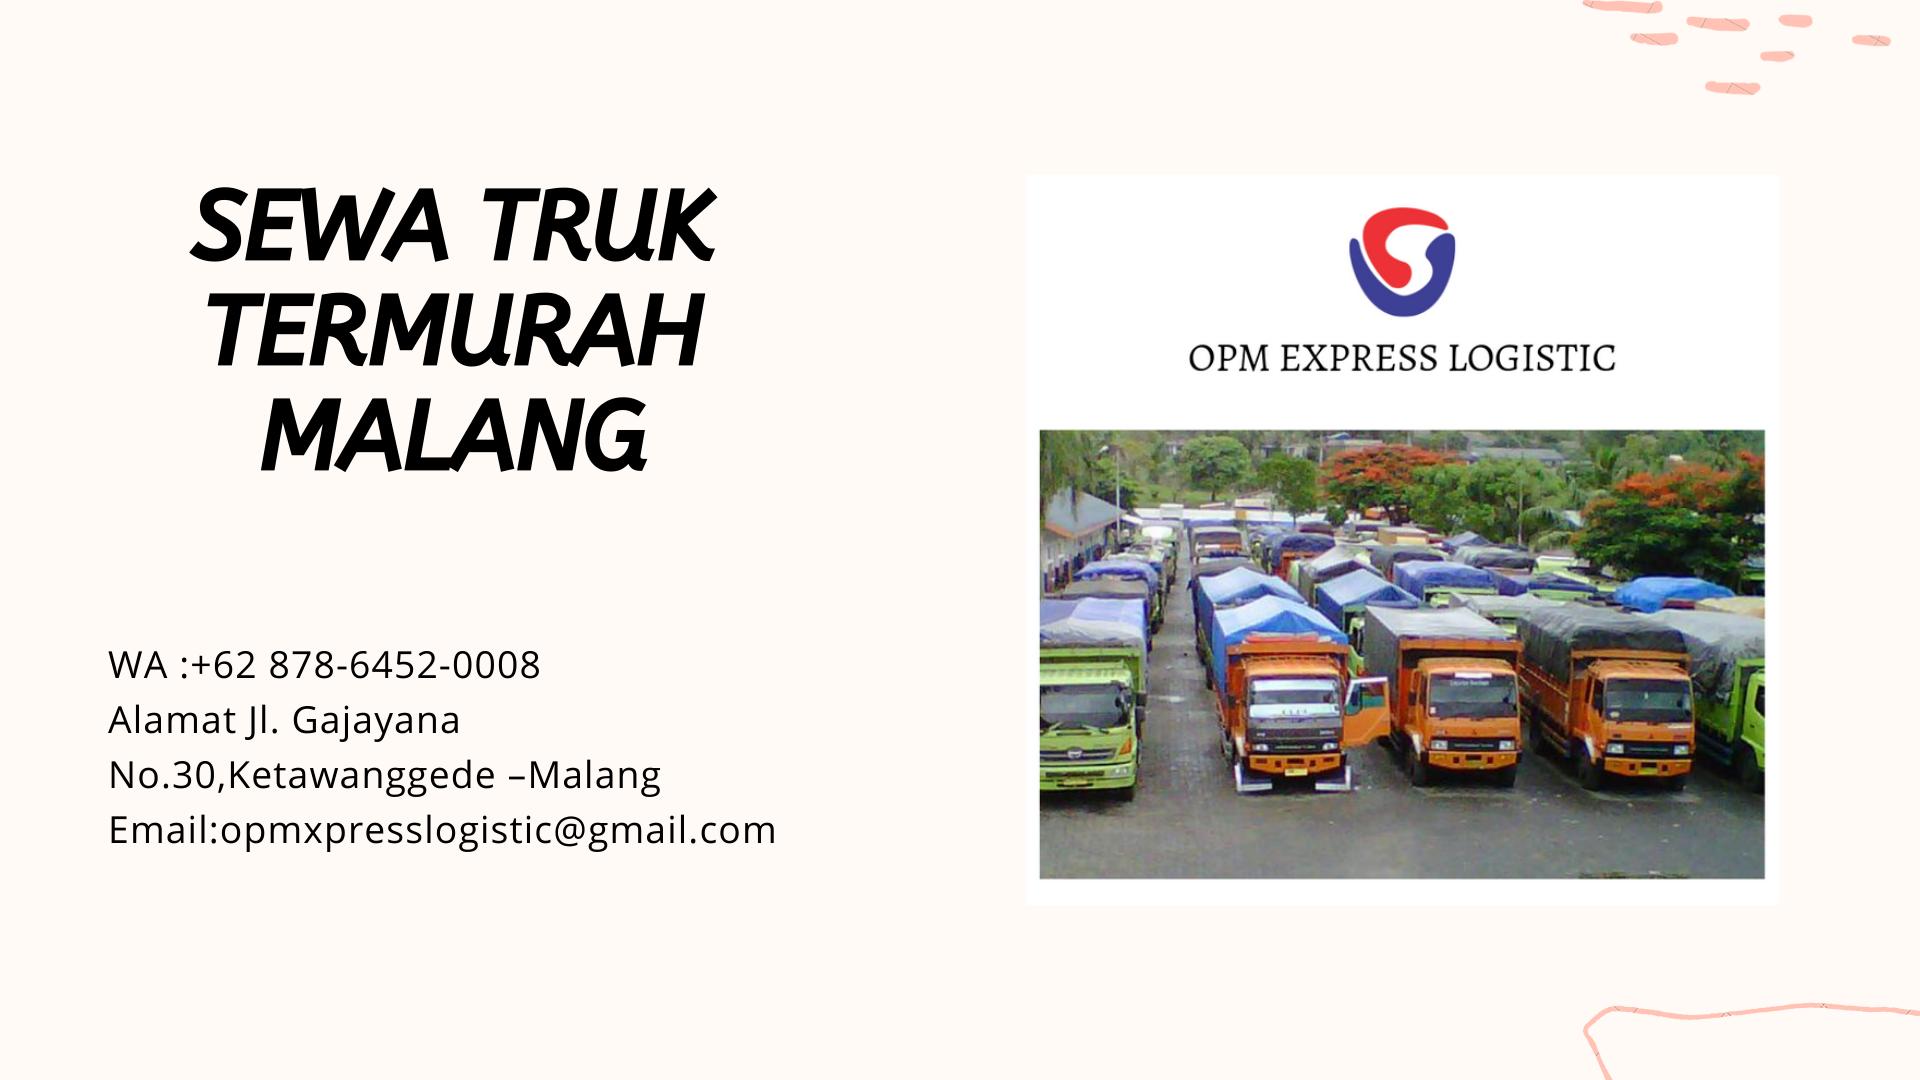 Sewa Truk Termurah Malang Wa 62 878 6452 0008 Opm Express Logistic